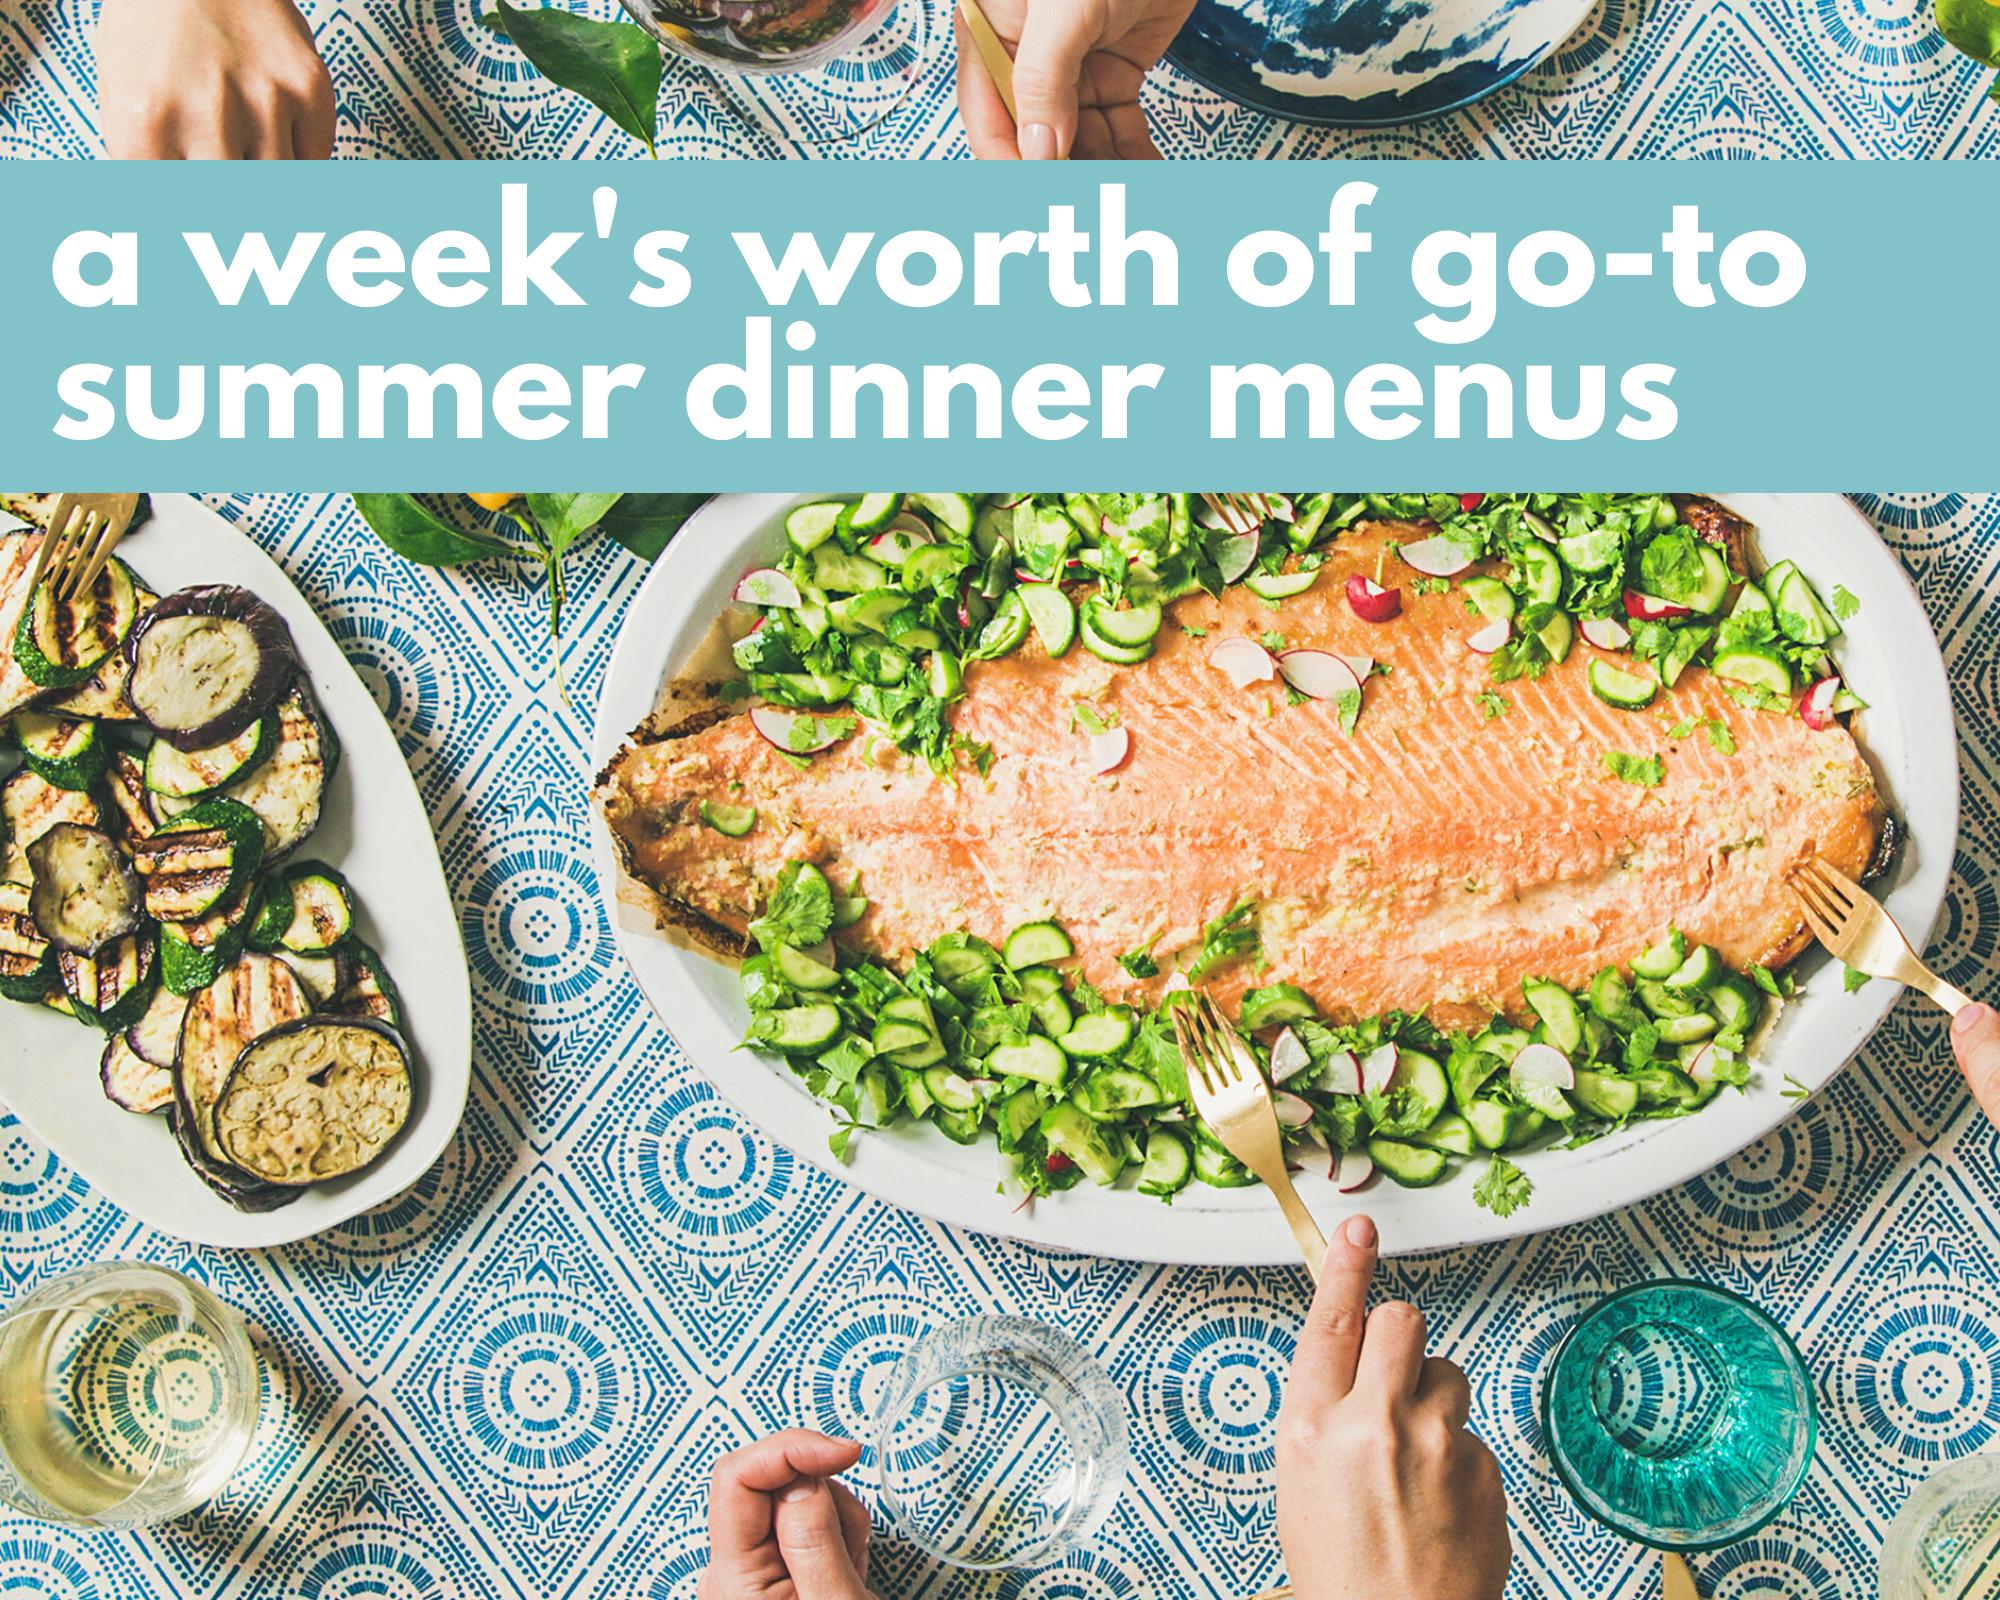 Salmon and zucchini summer dinner